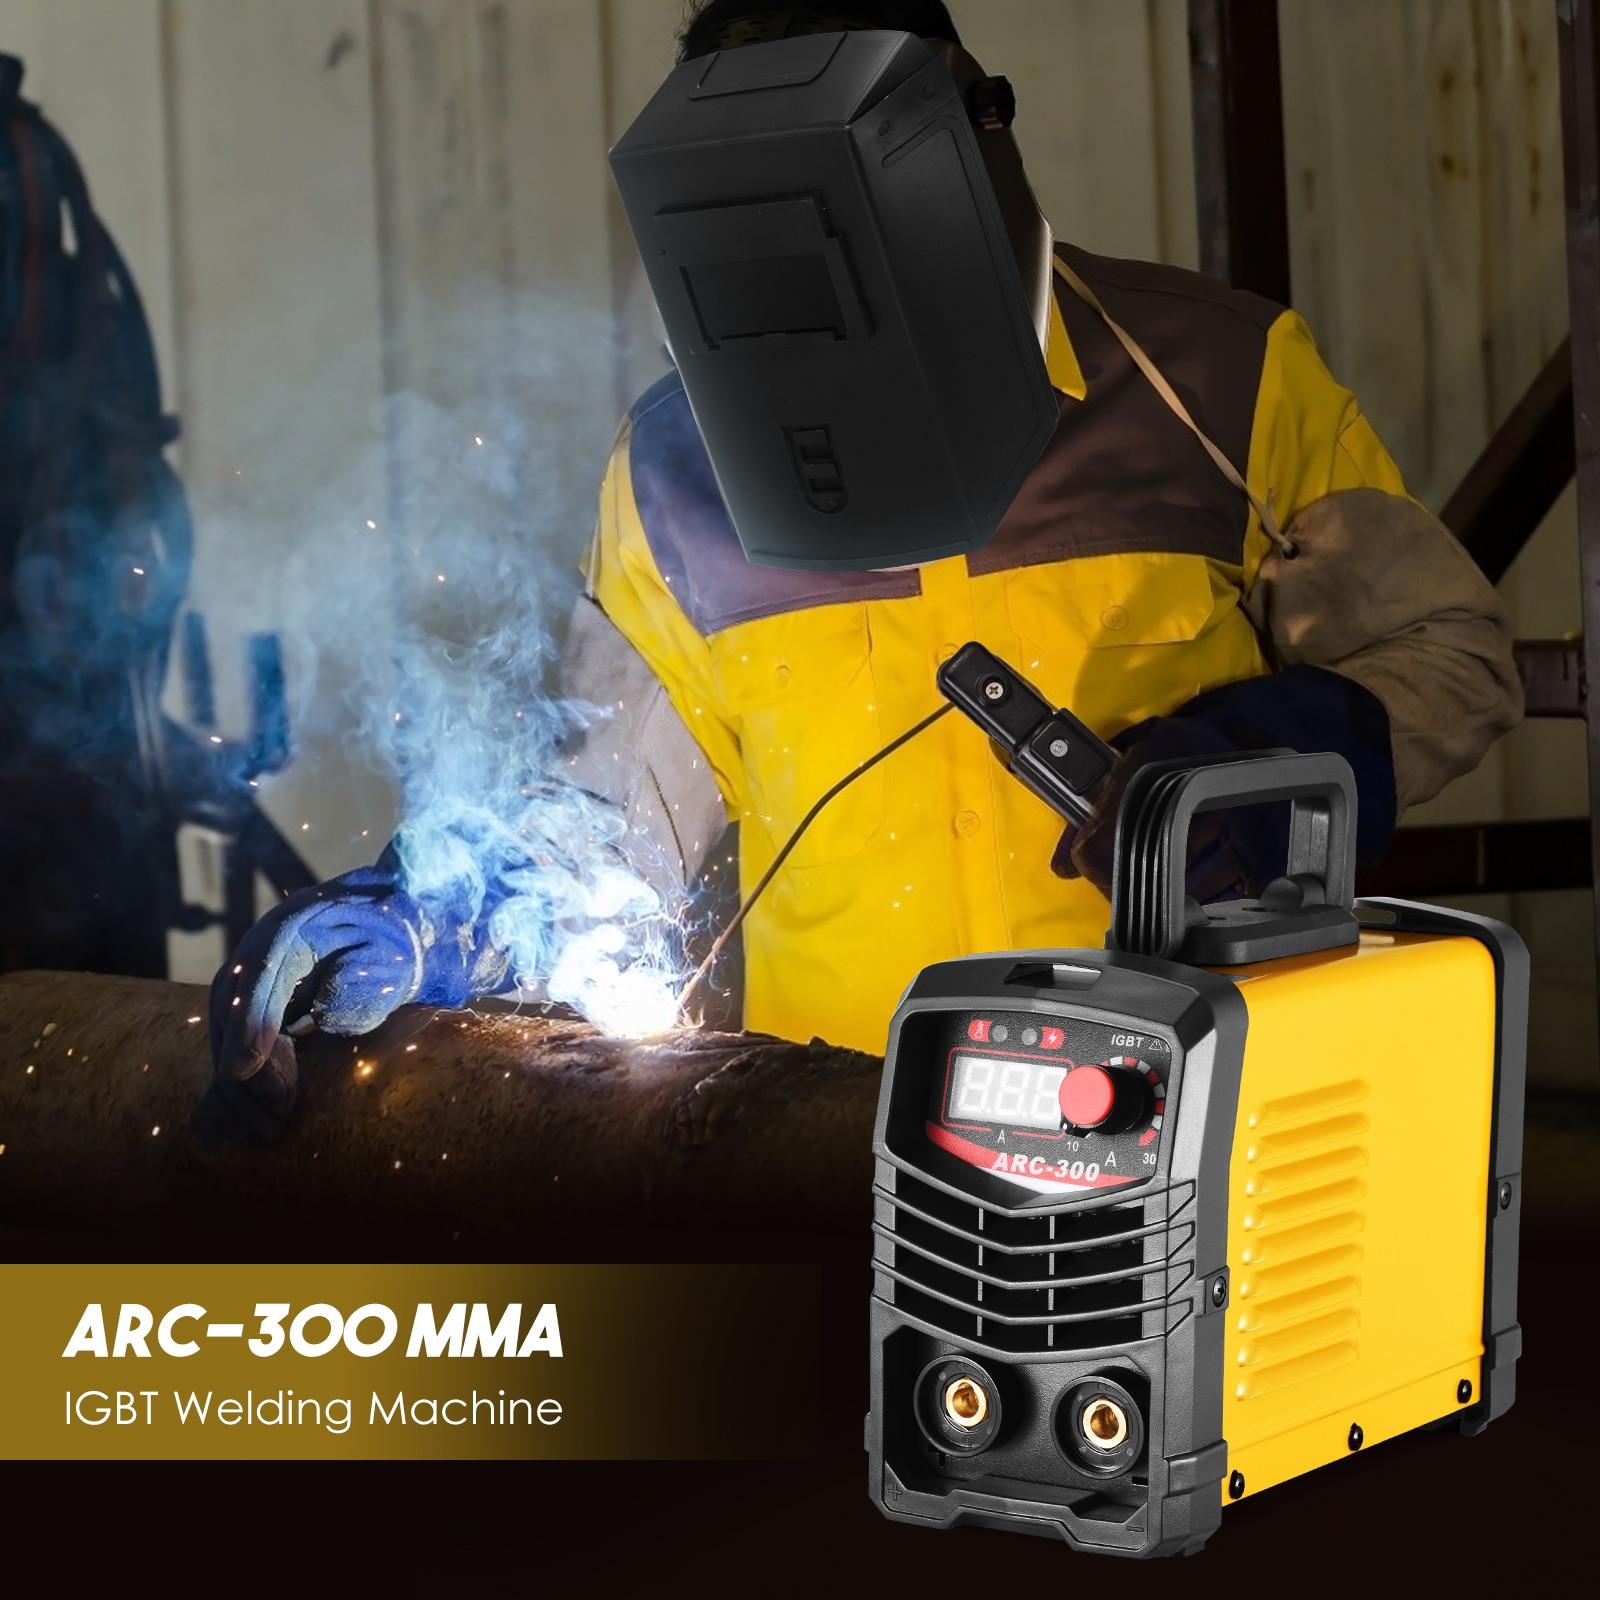 ARC MMA -300Amp IGBT Electric LCD Welders Inverter 220 V Weldering Machine with Electrode Holder Grounding Clip Welding Rods enlarge